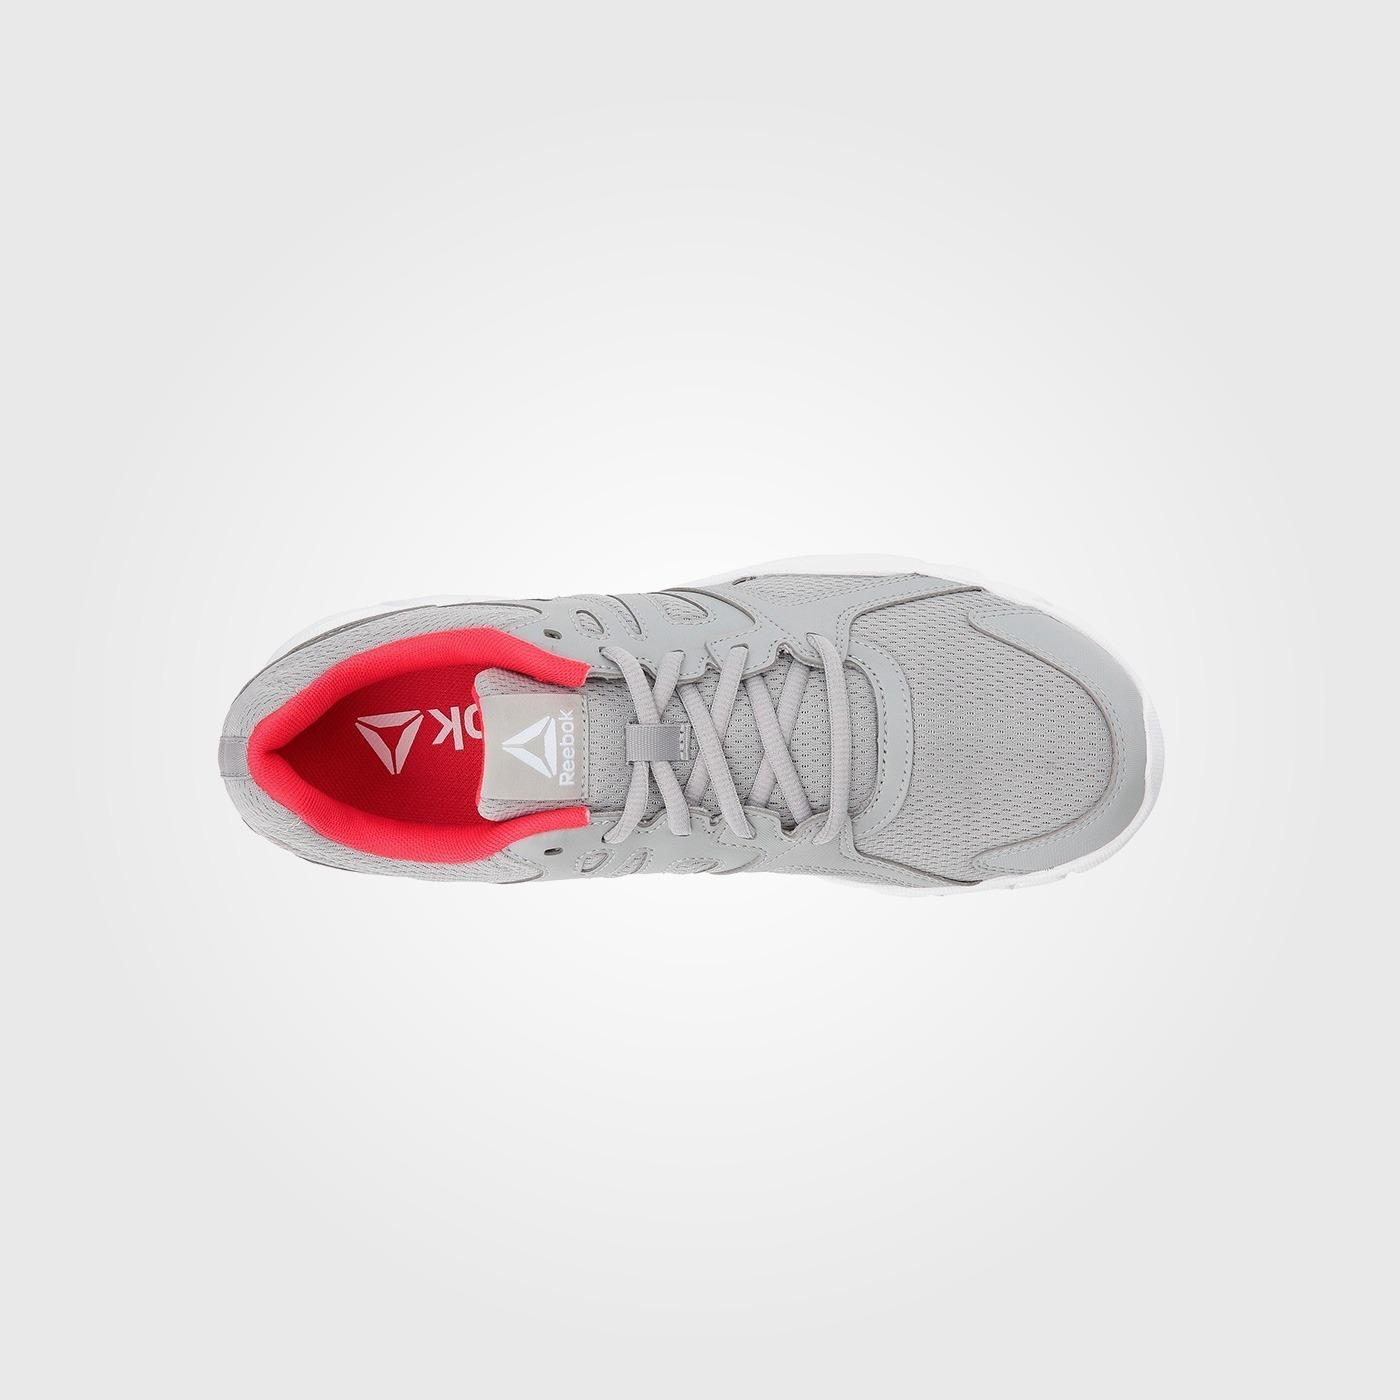 Кроссовки Reebok Trainfusion Nine 3.0 Grey/White/Red